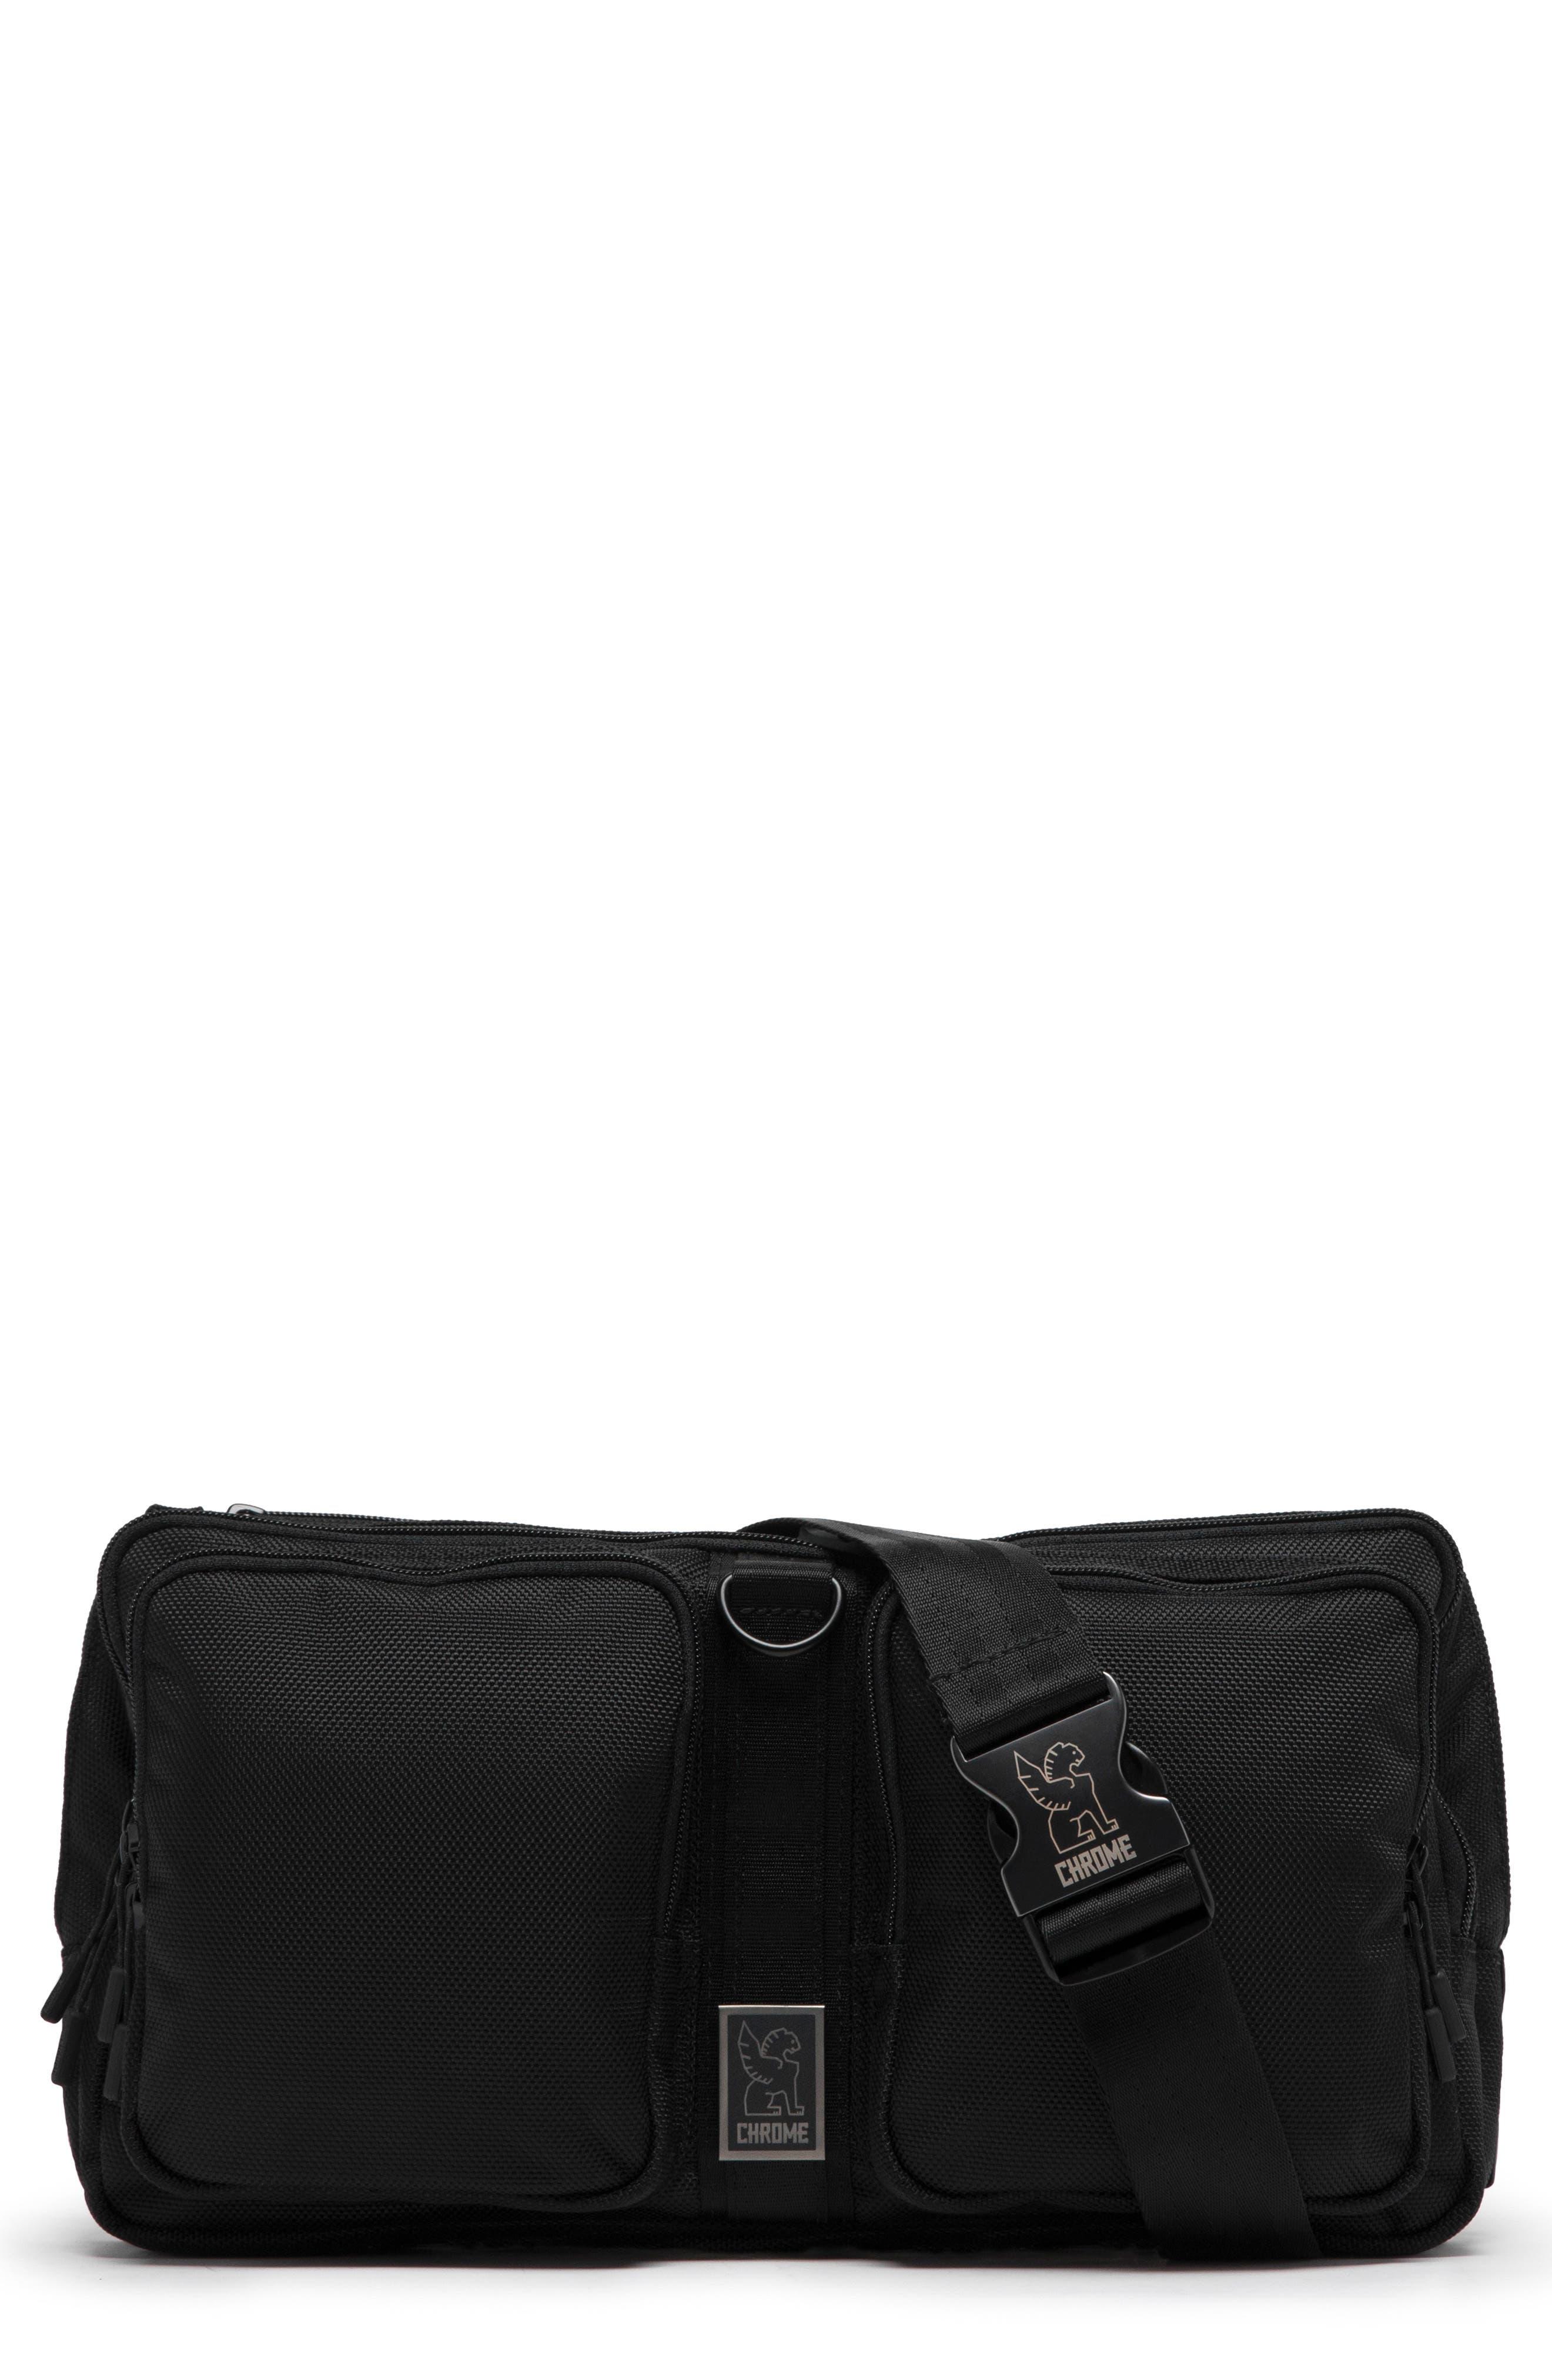 MXD Segment Sling Bag,                             Main thumbnail 1, color,                             ALL BLACK